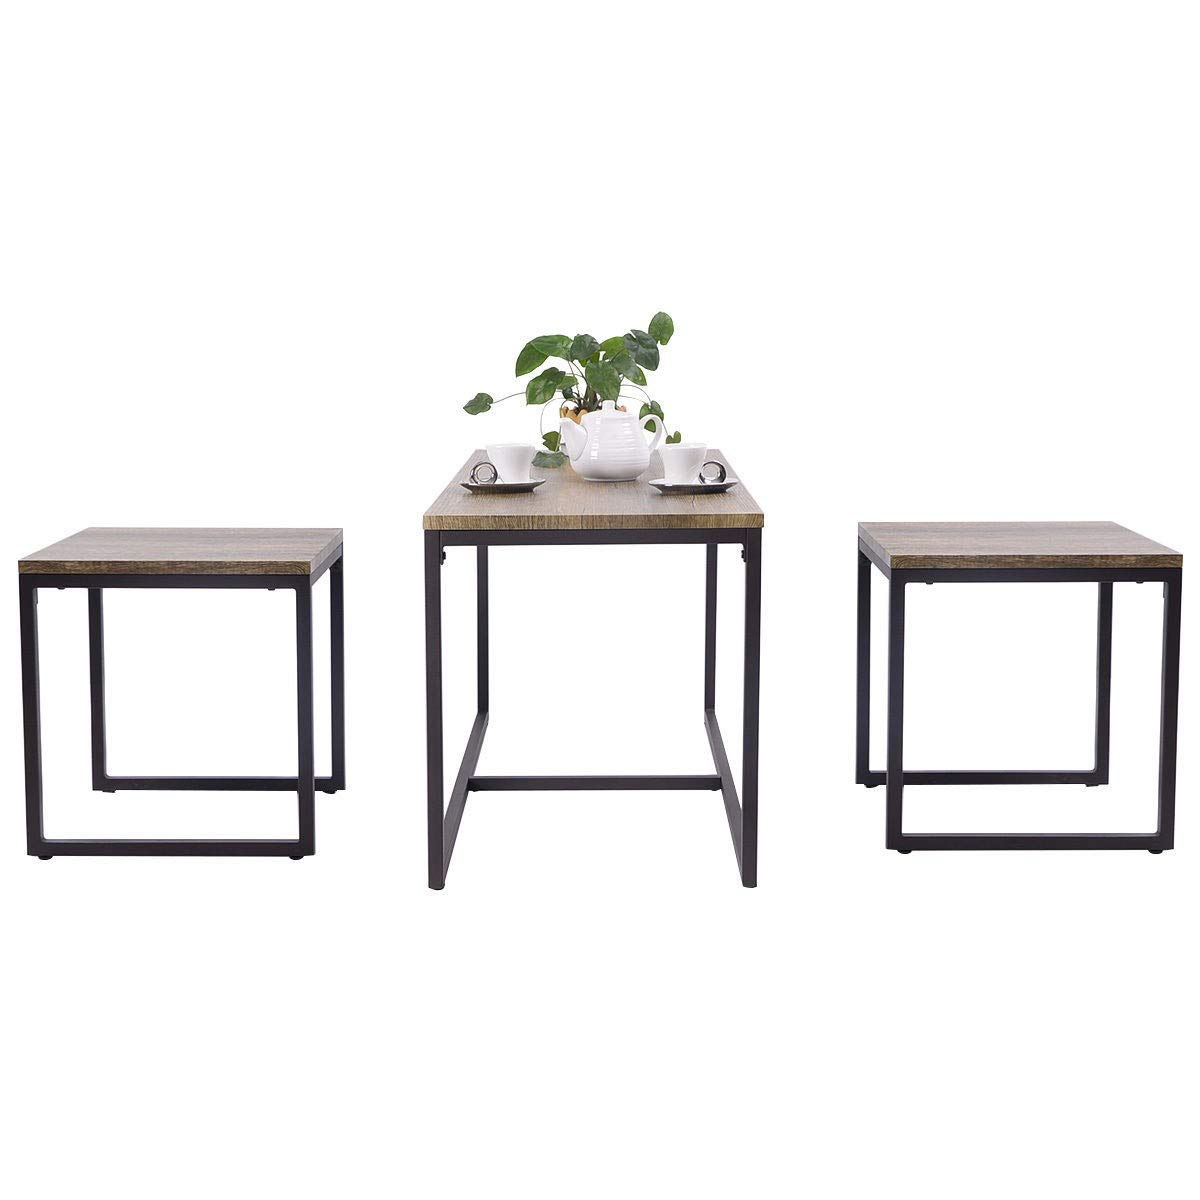 Apontus 3 Piece Nesting Coffee & End Table Set Wood Modern Living Room Furniture Decor